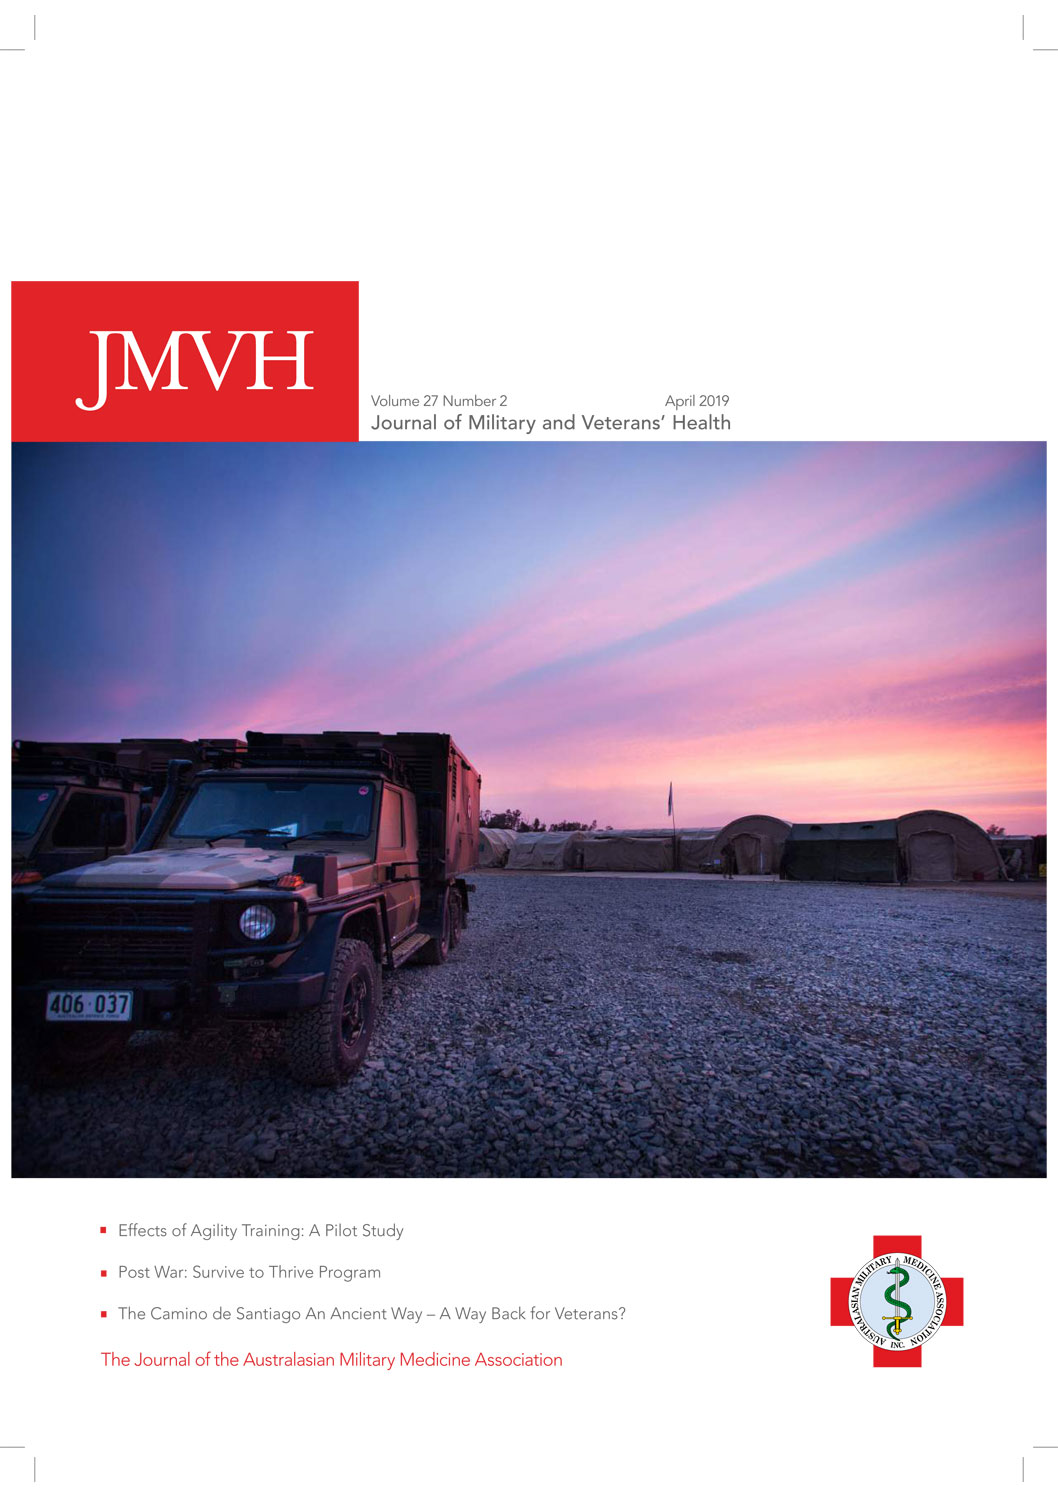 AMMA-JMVH-April-2019_print